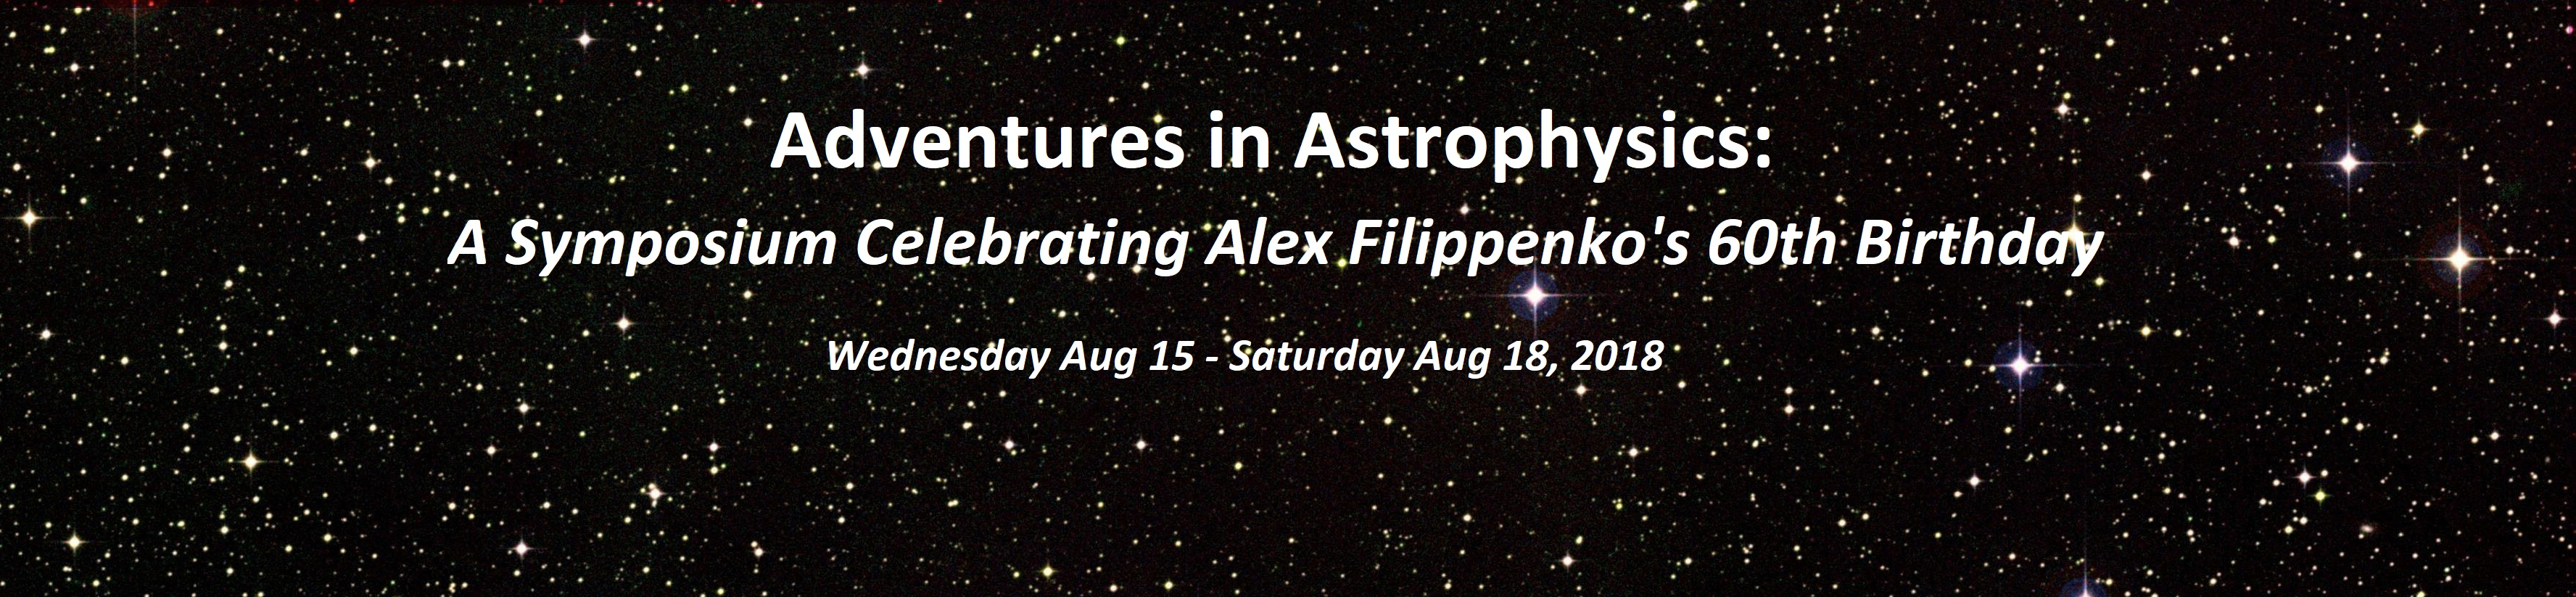 Adventures in Astrophysics